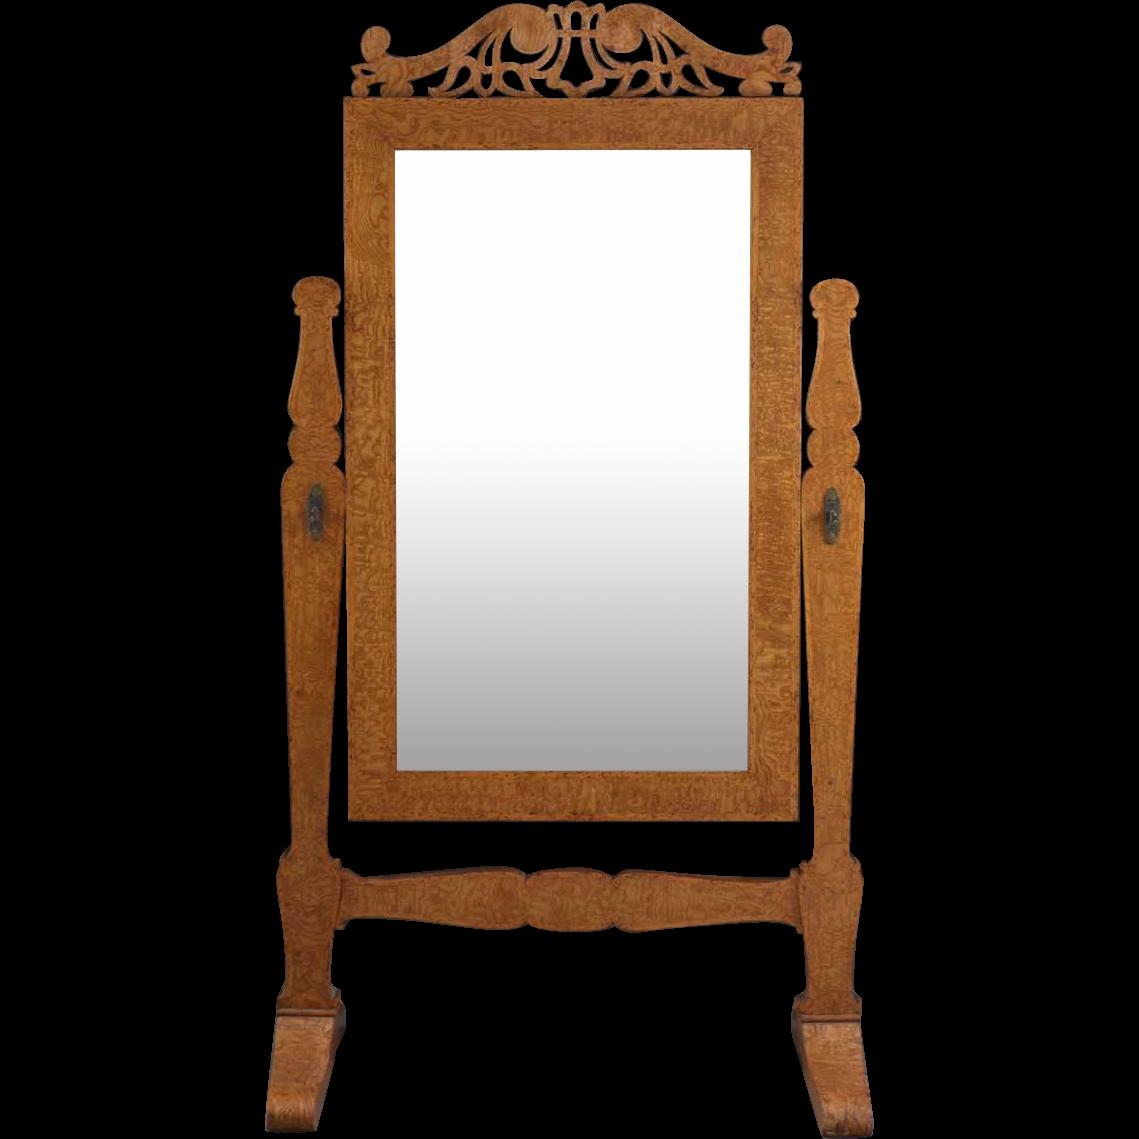 French Pollard Elm Cheval Floor Mirror